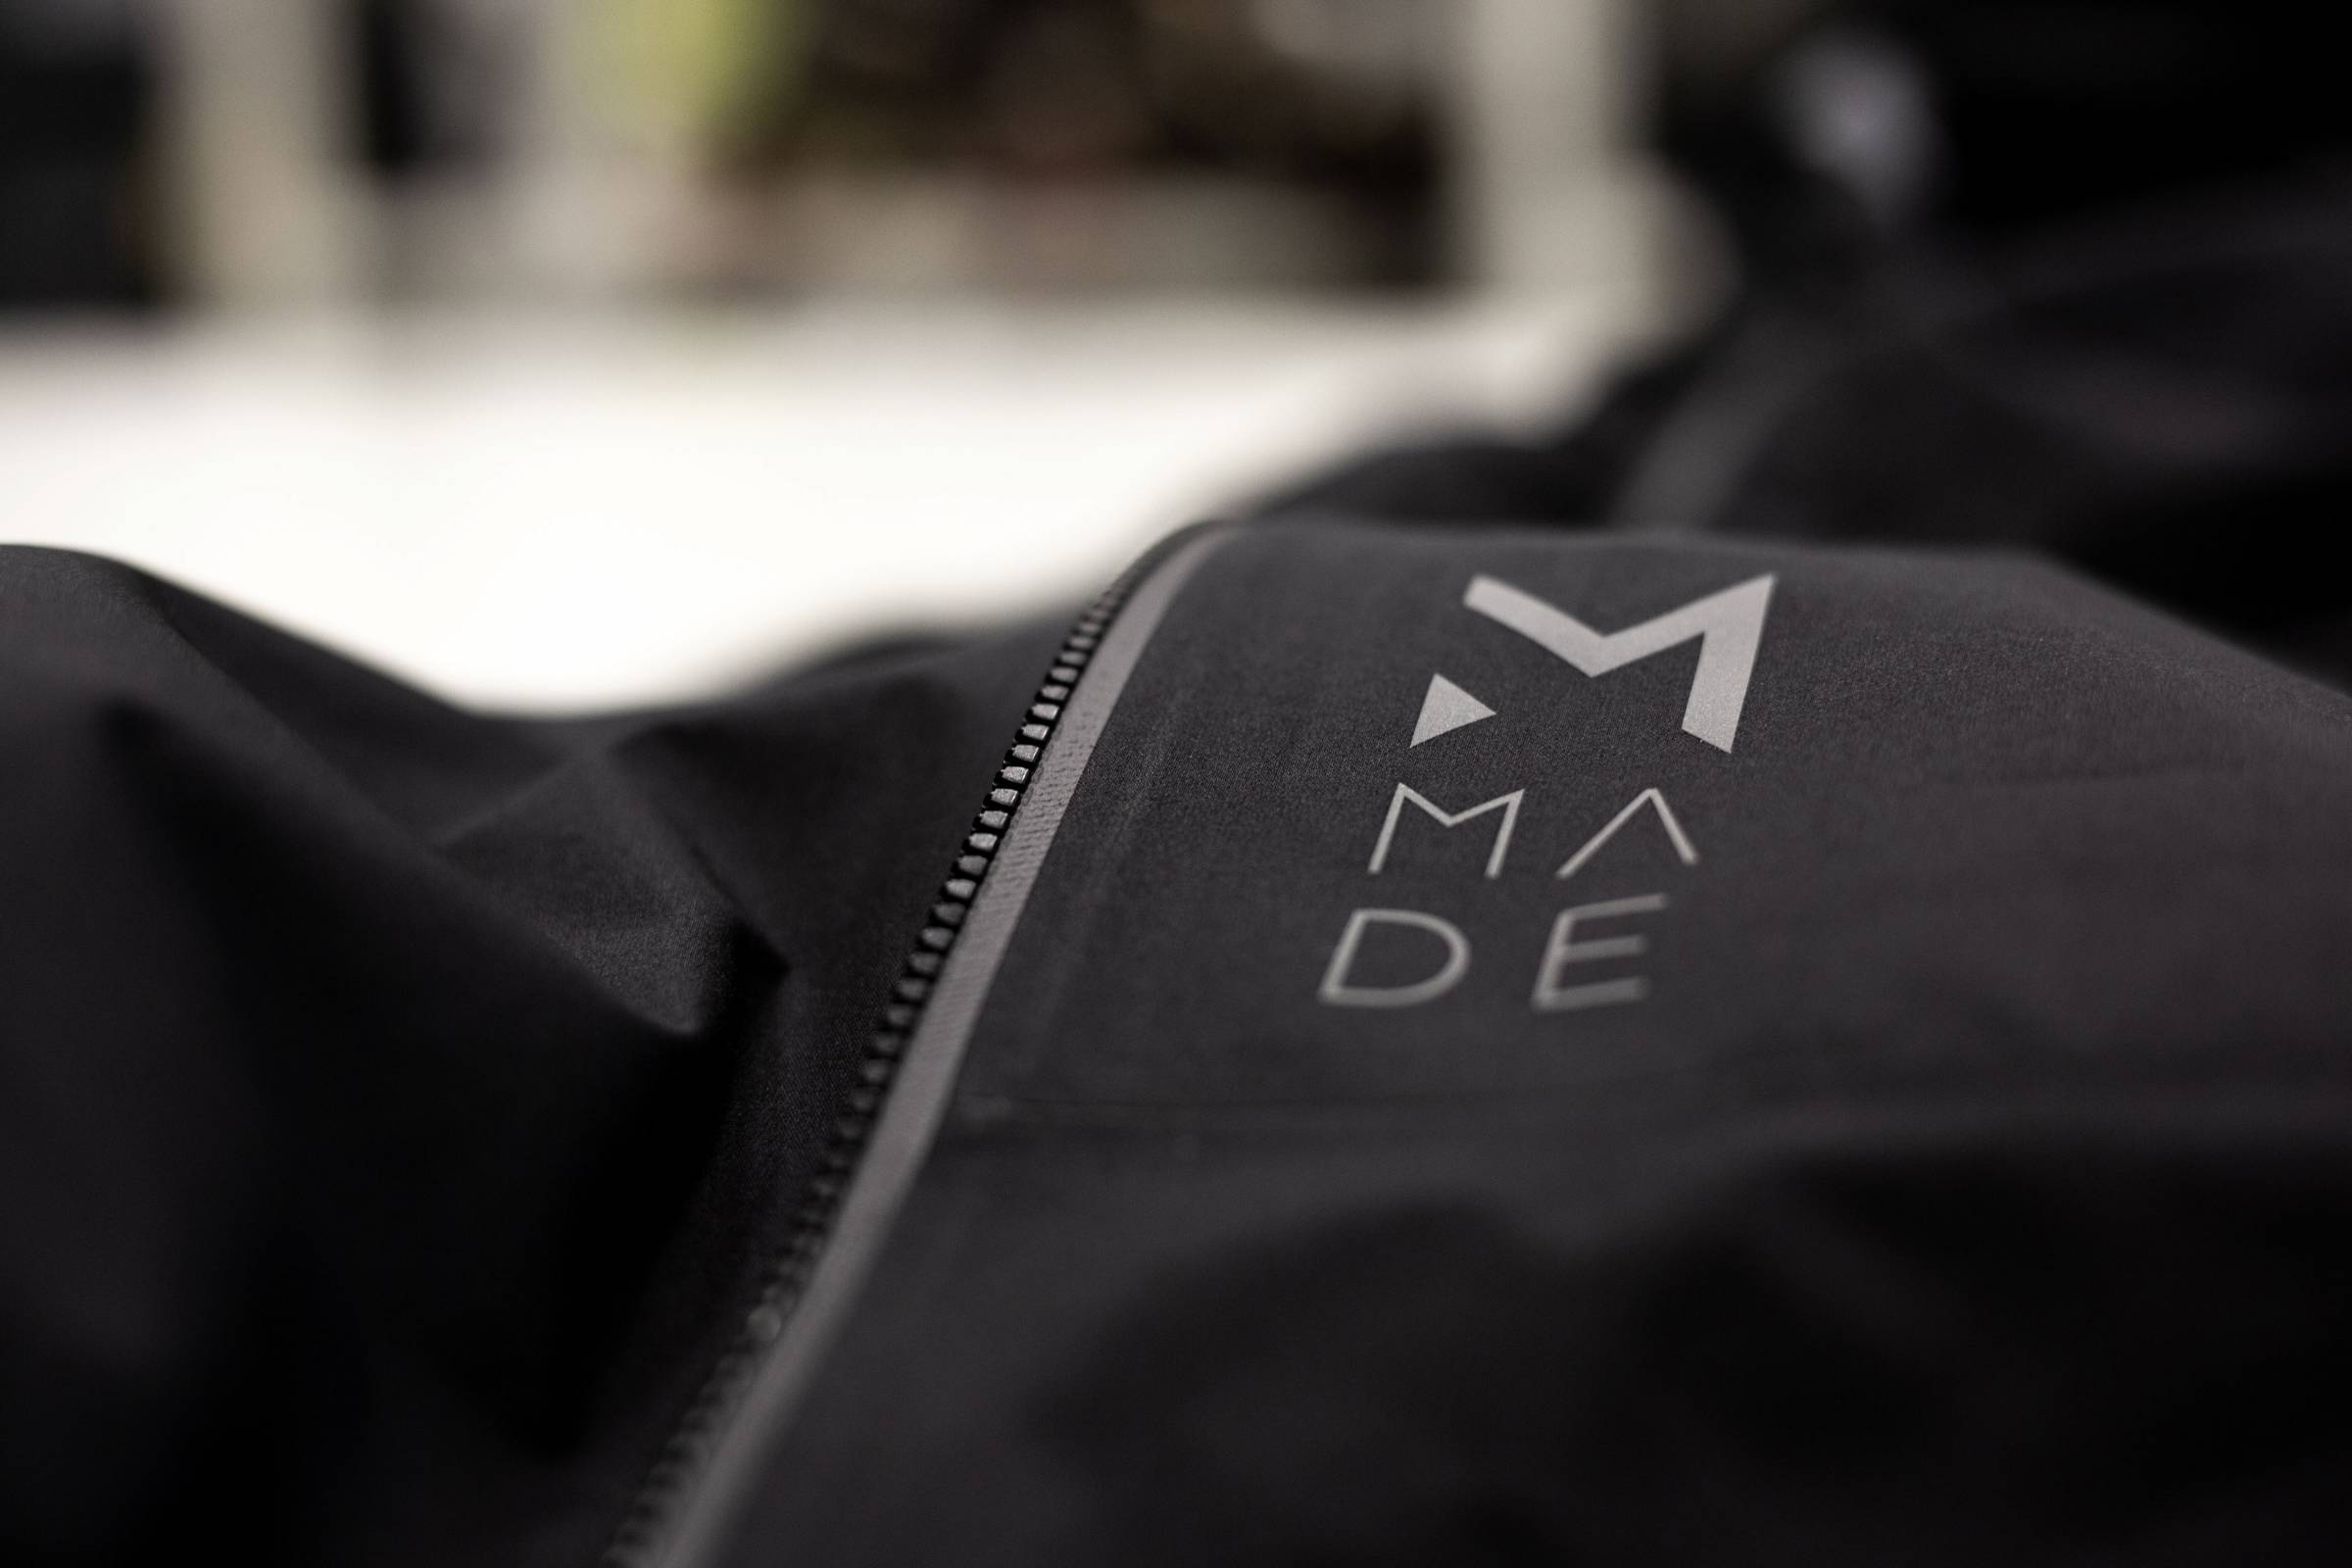 Made brand fabric